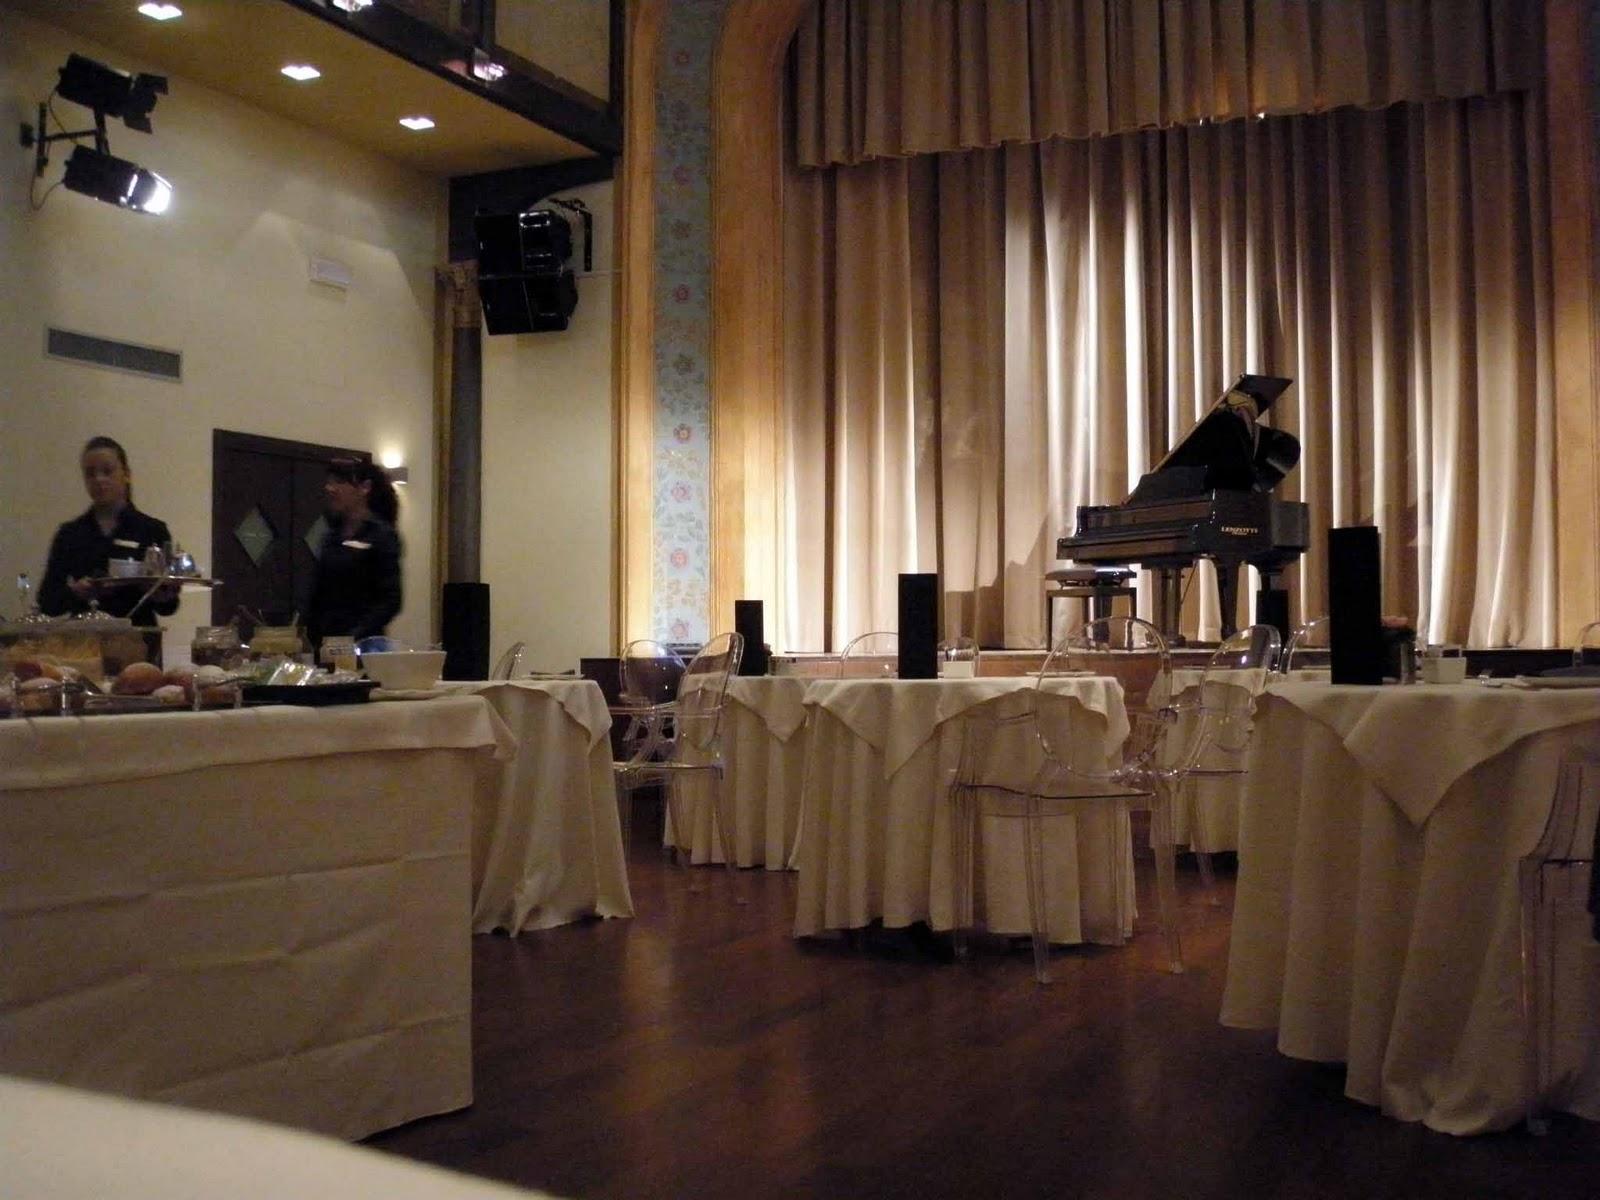 http://1.bp.blogspot.com/_jMDiAk8Aiq4/TQsdtjkqvFI/AAAAAAAAAHI/nLzpSGoTIYk/s1600/sala+teatro+hotel+i+portici.jpg